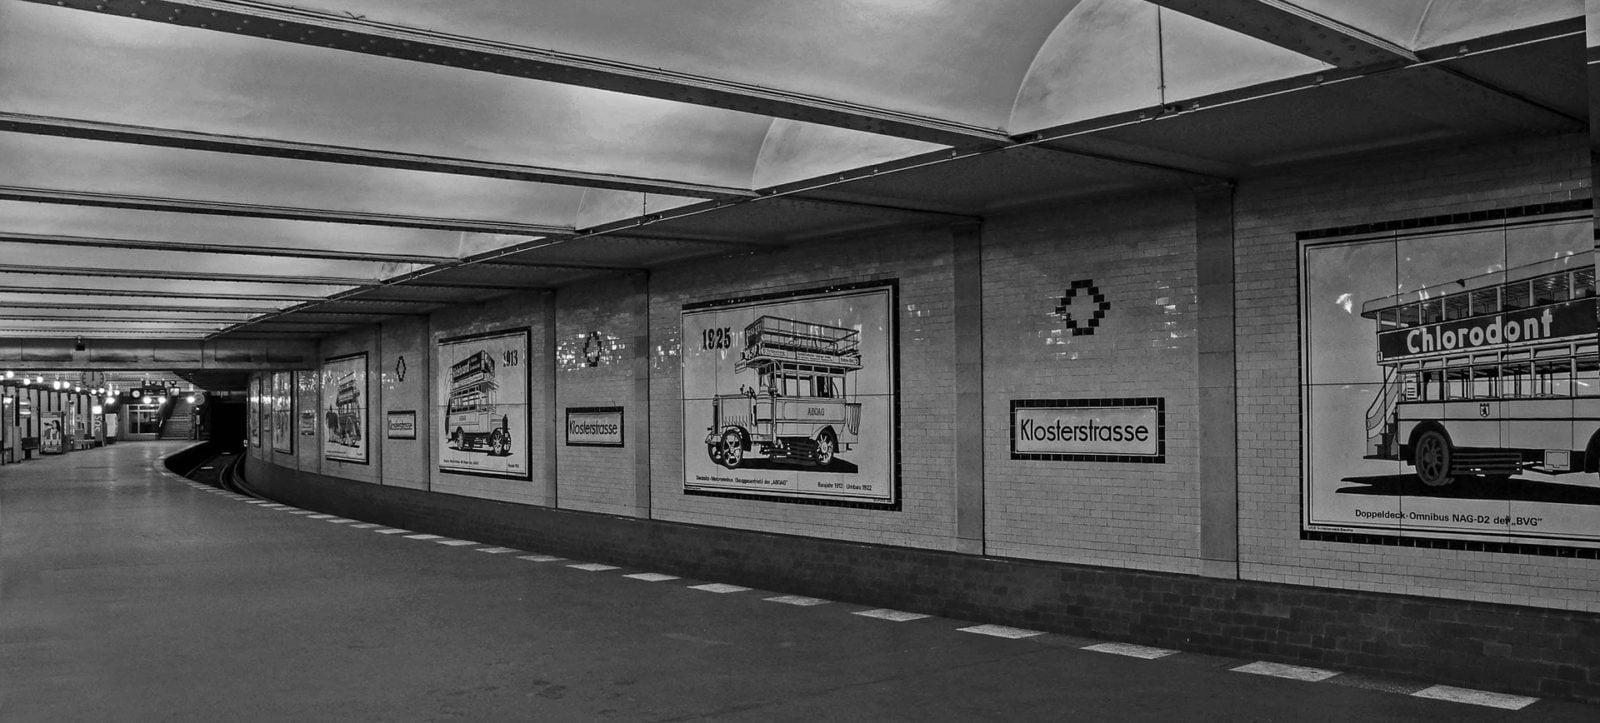 berlin 2153481 1920